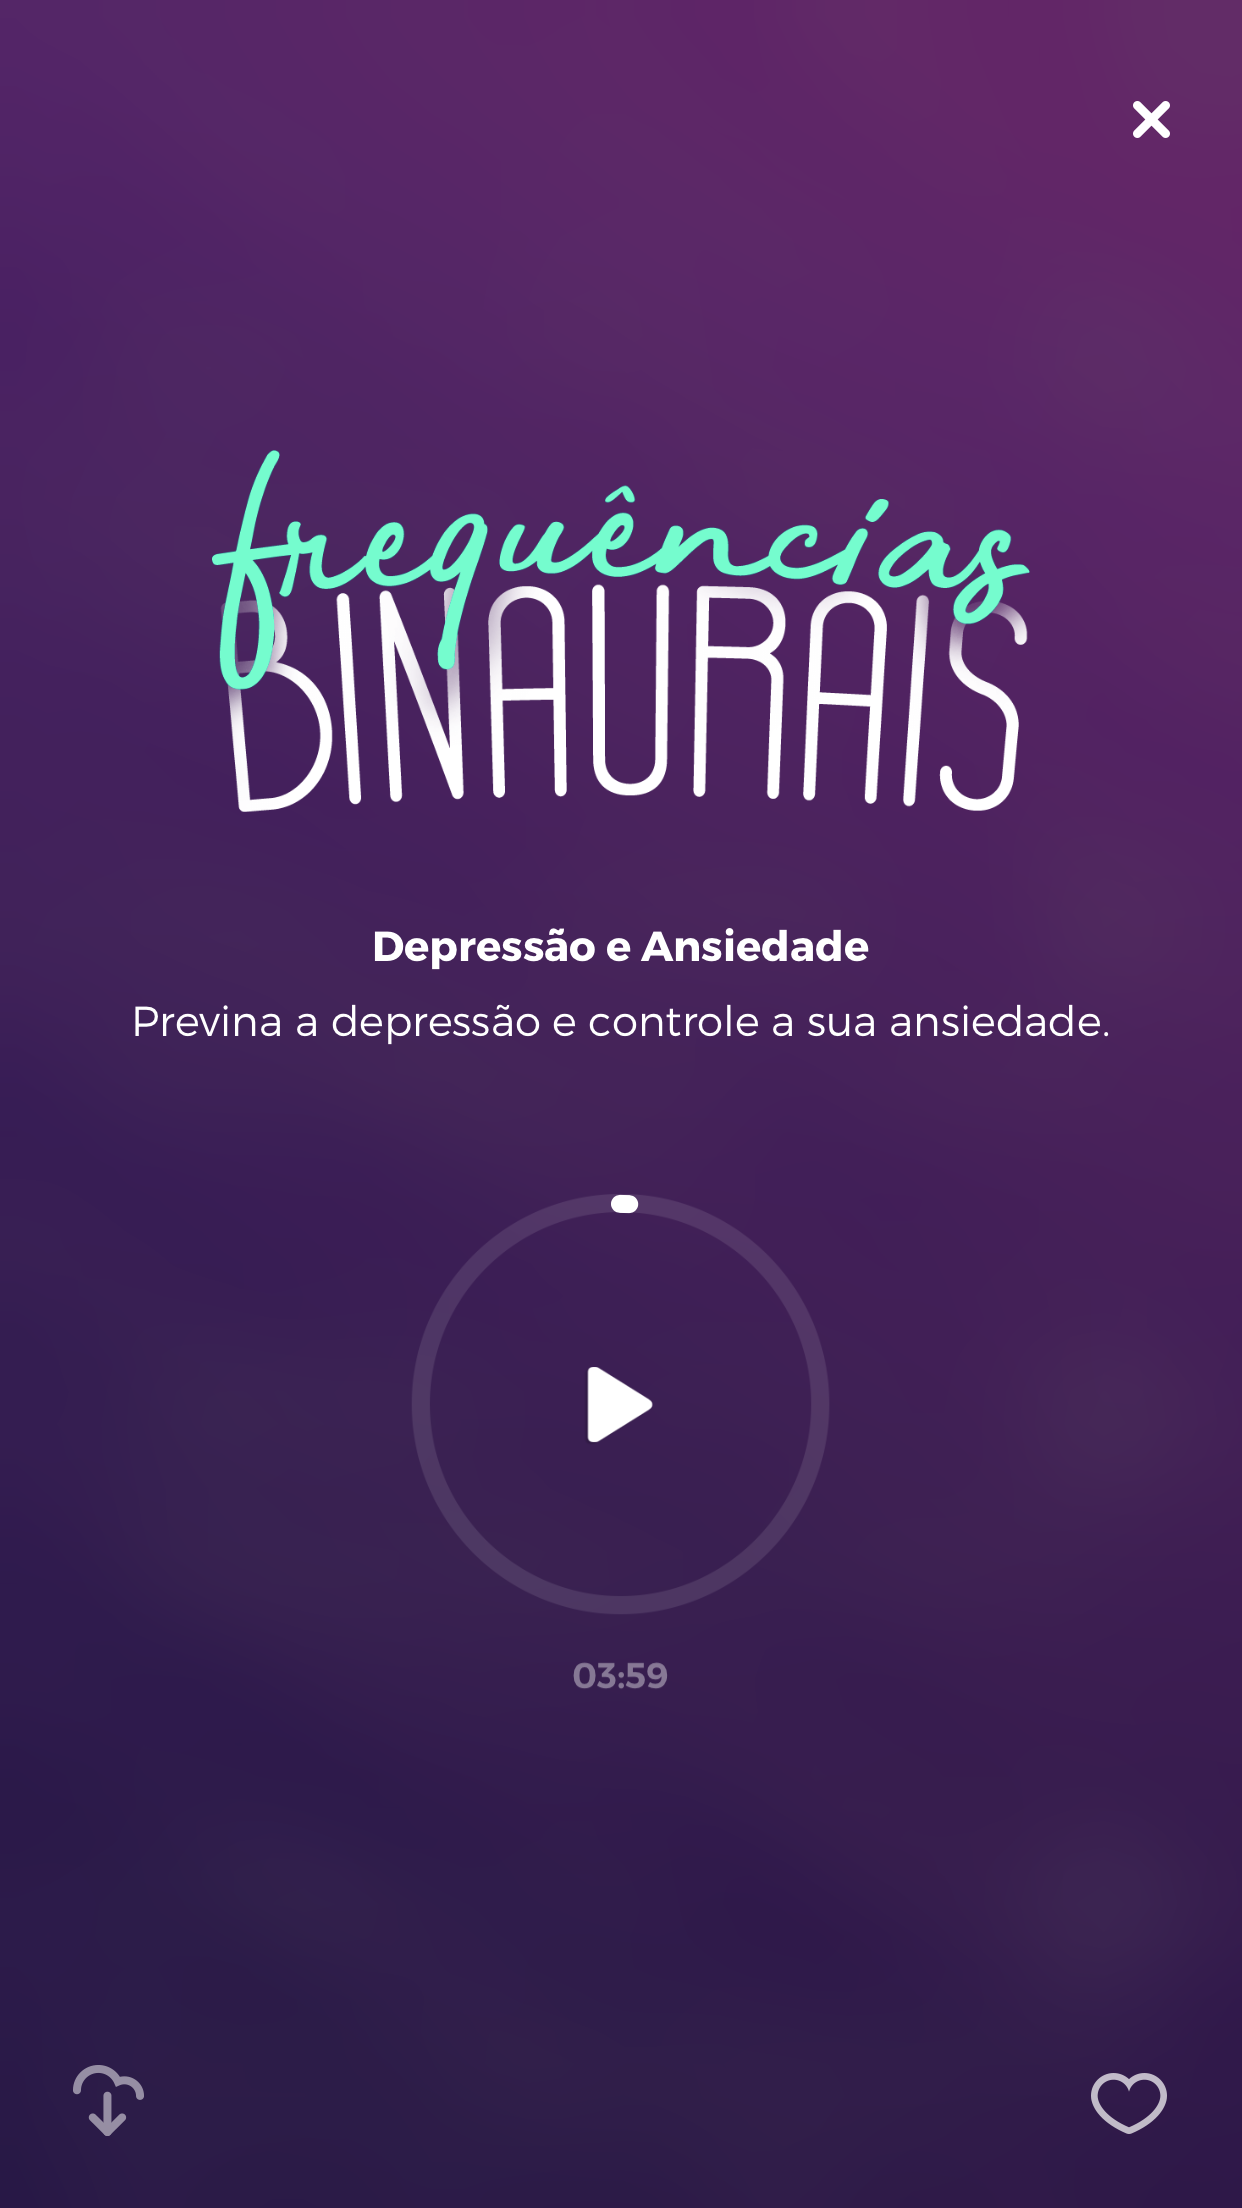 frequências binaurais